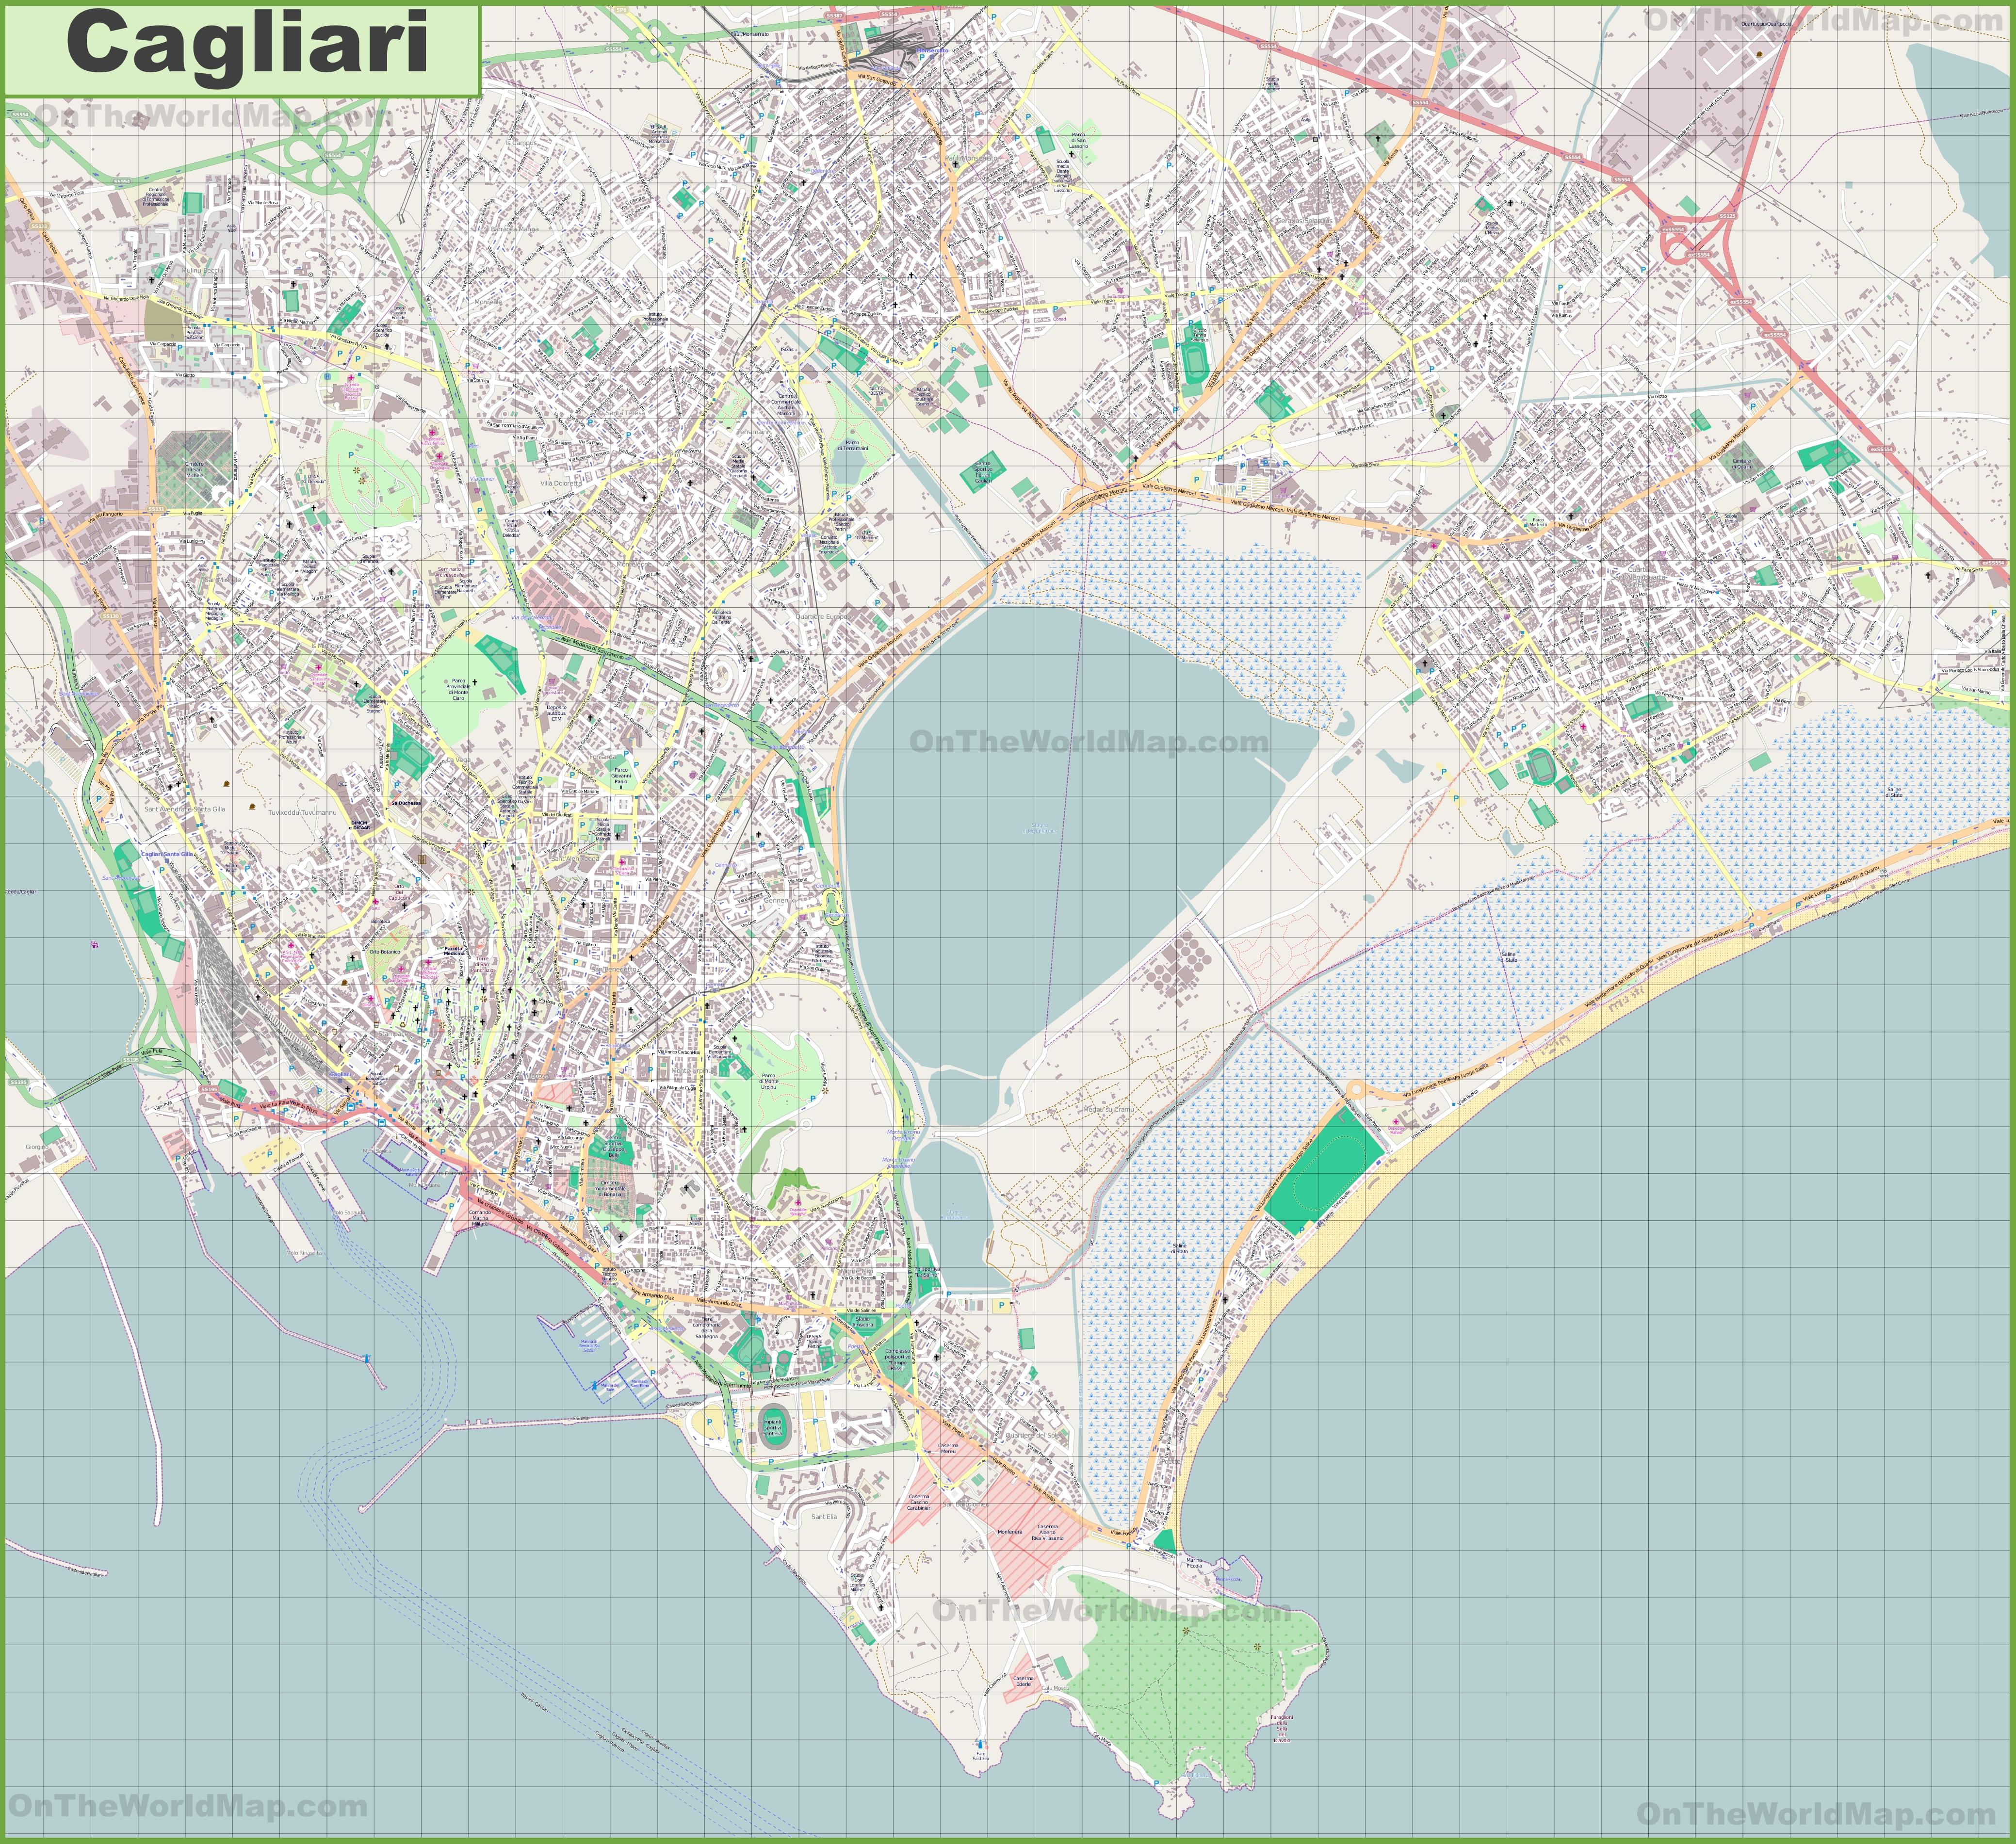 recensioni evasioni cagliari map - photo#3